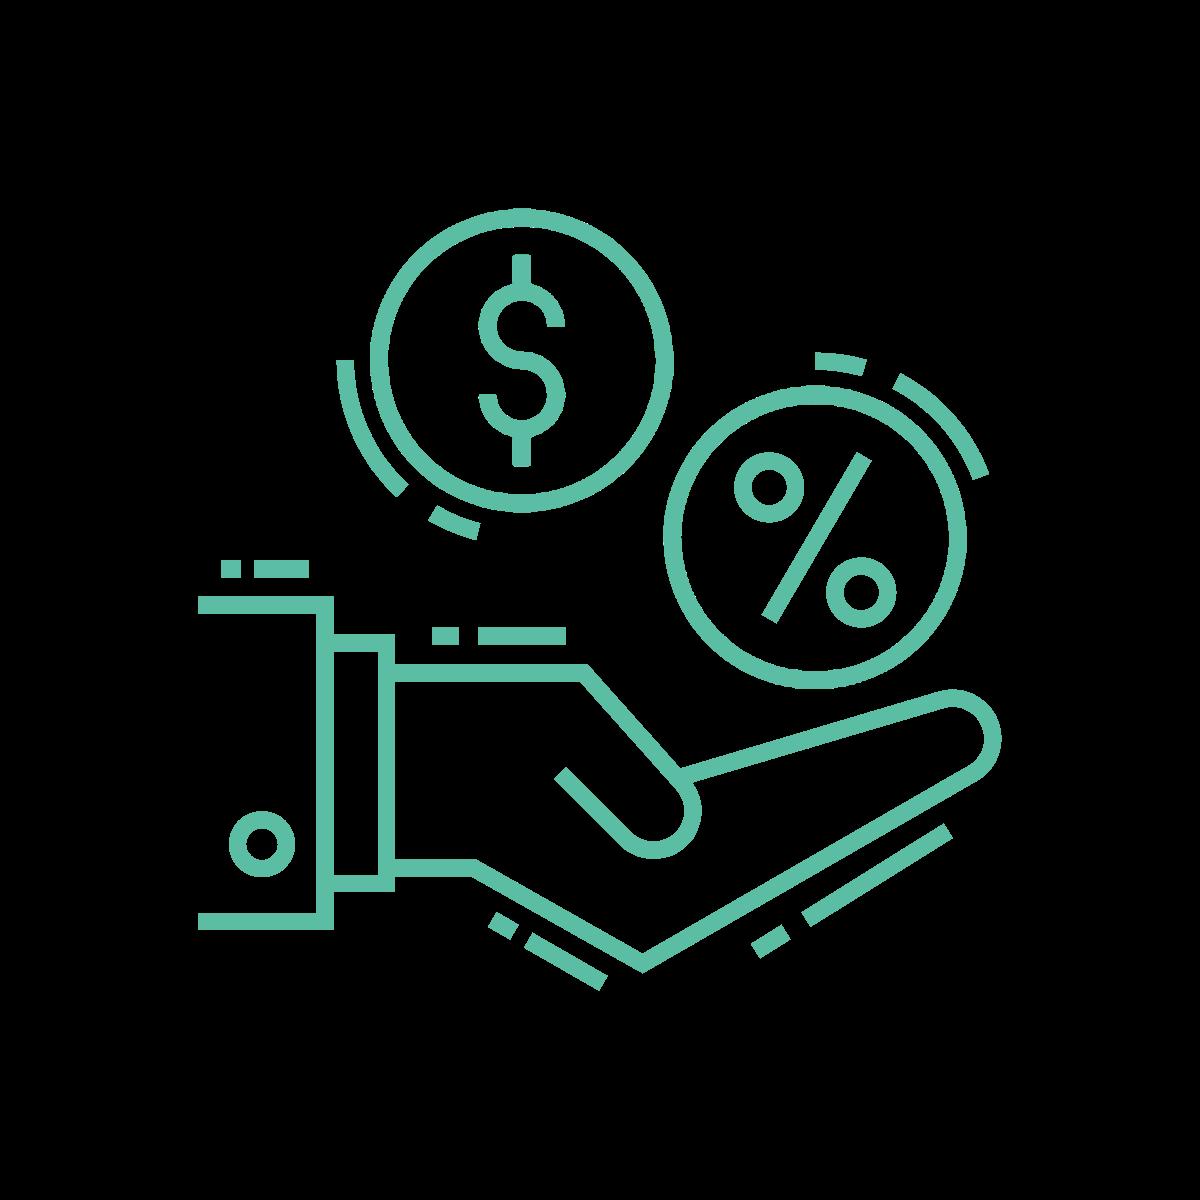 Icon of hand receiving money